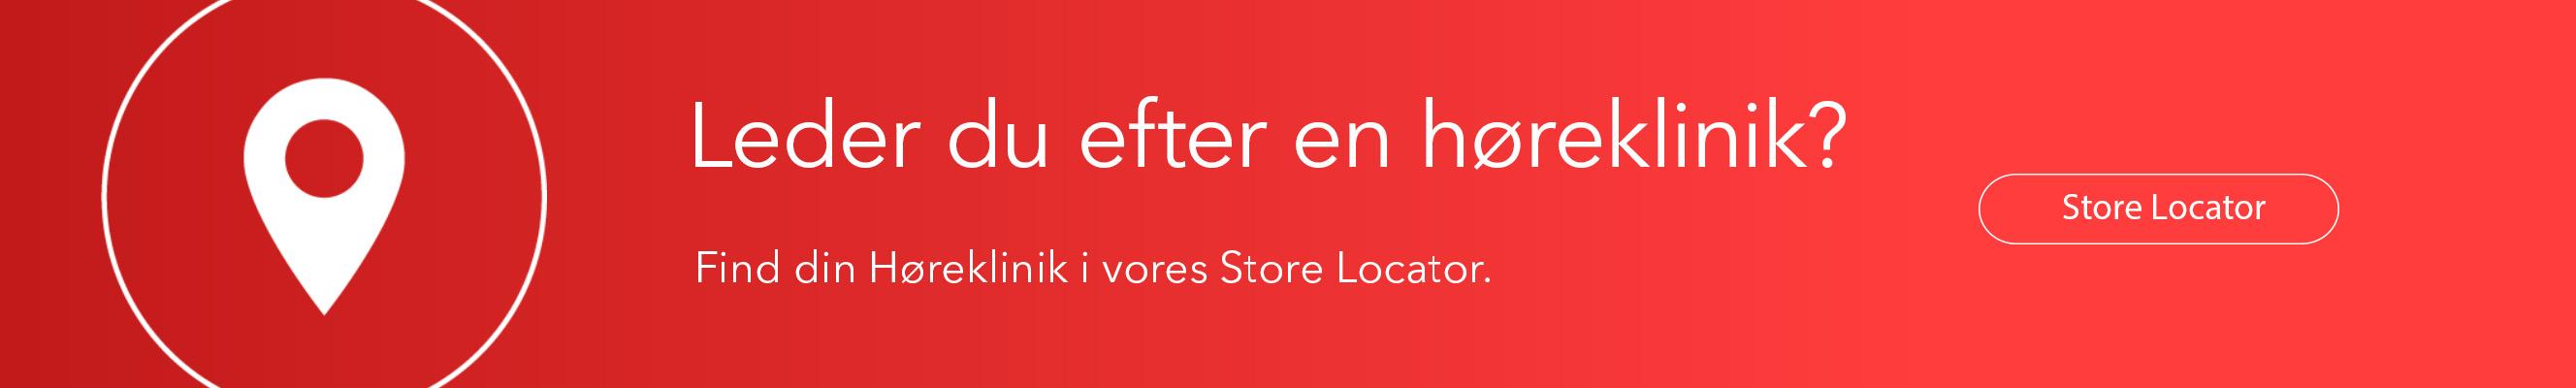 DK_StoreLocator_teaser_2656x400